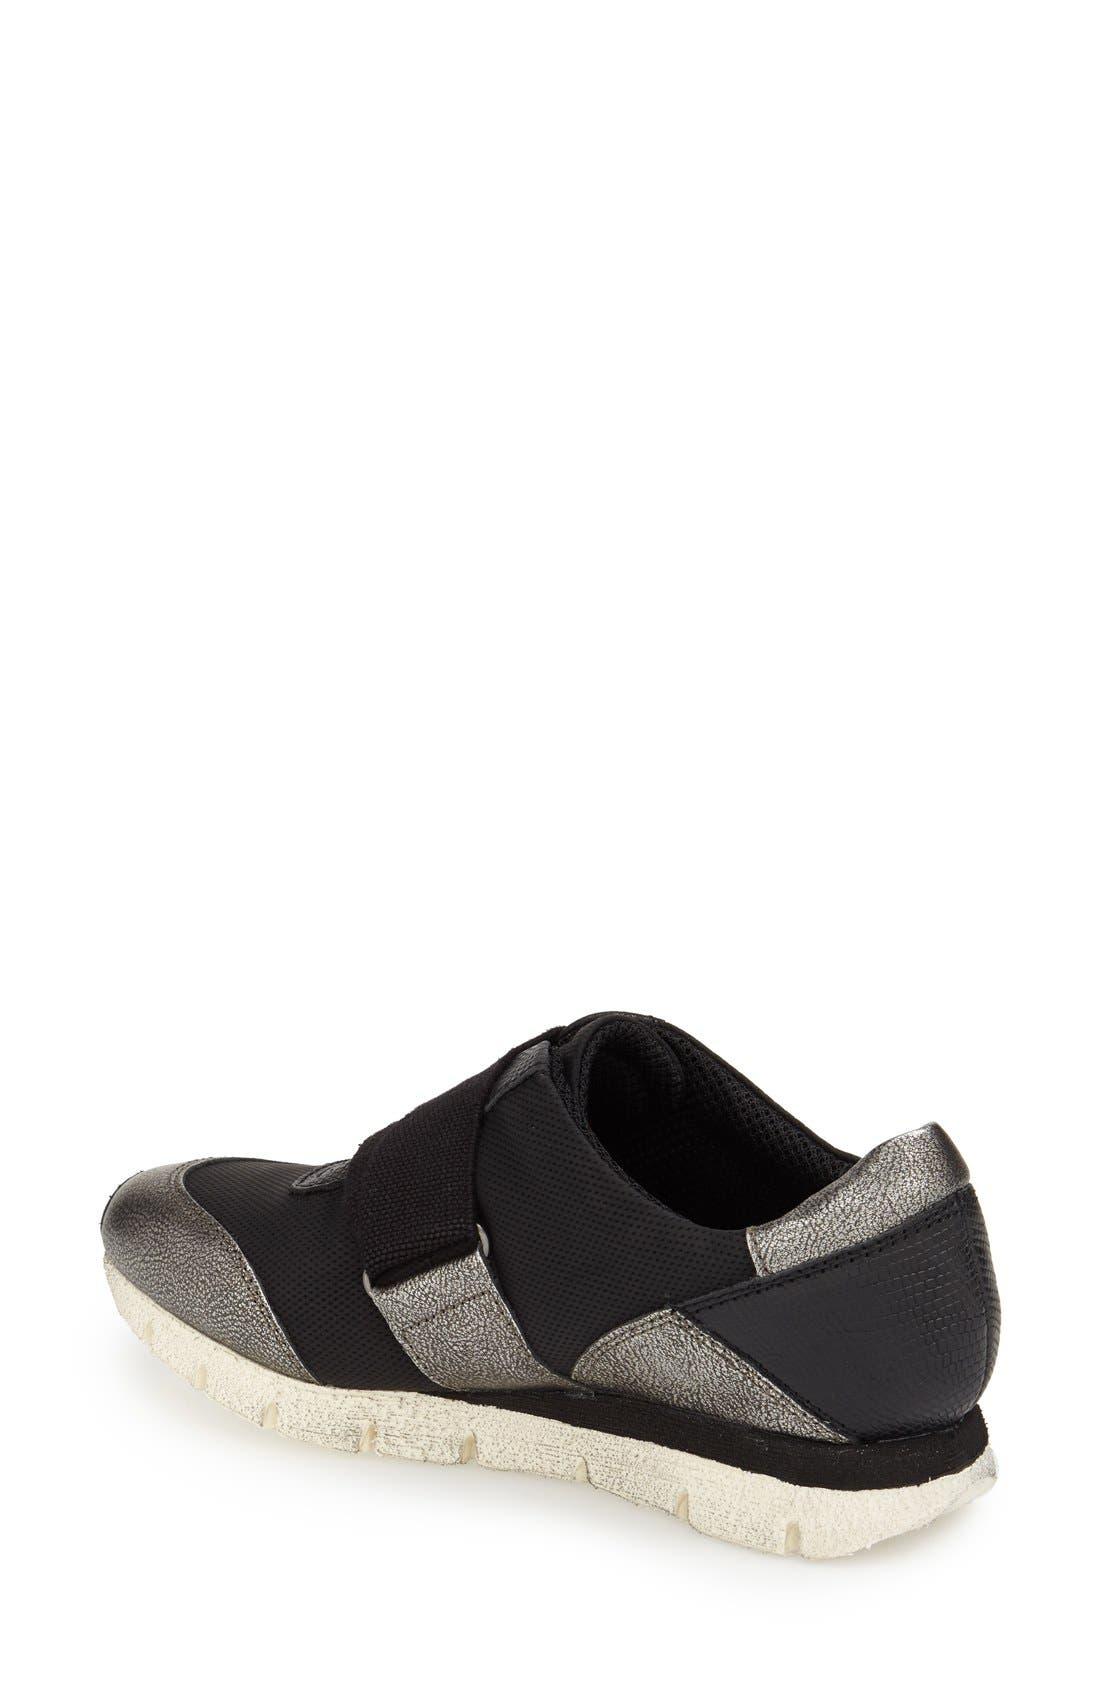 Alternate Image 2  - OTBT 'New Wave' Sneaker (Women)